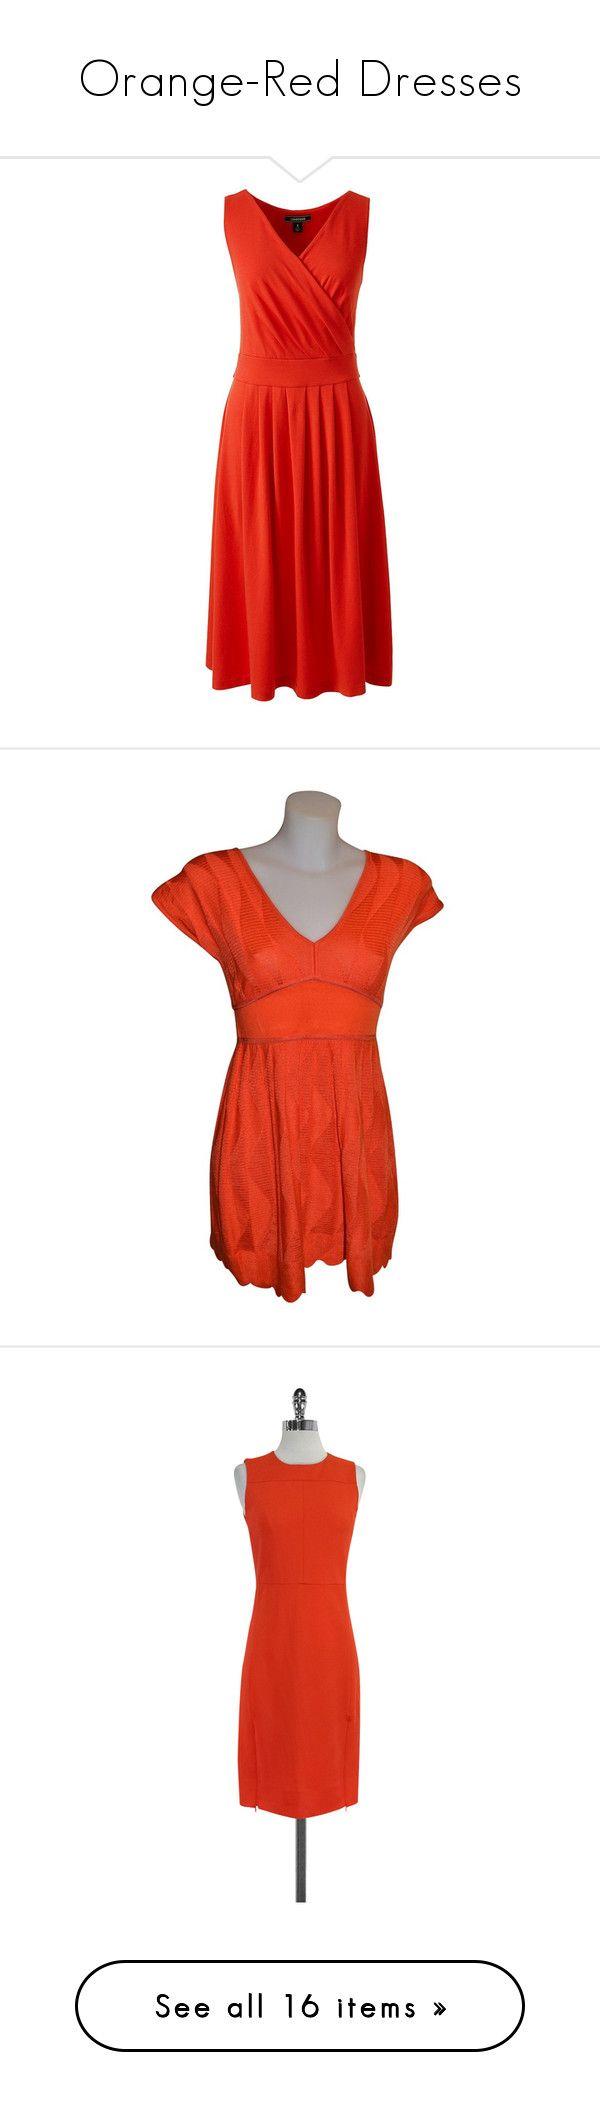 """Orange-Red Dresses"" by tegan-b-riley on Polyvore featuring dresses, orange, red dress, petite dresses, orange fit and flare dress, red fit and flare dress, orange dress, wool dress, red orange dress and preowned dresses"